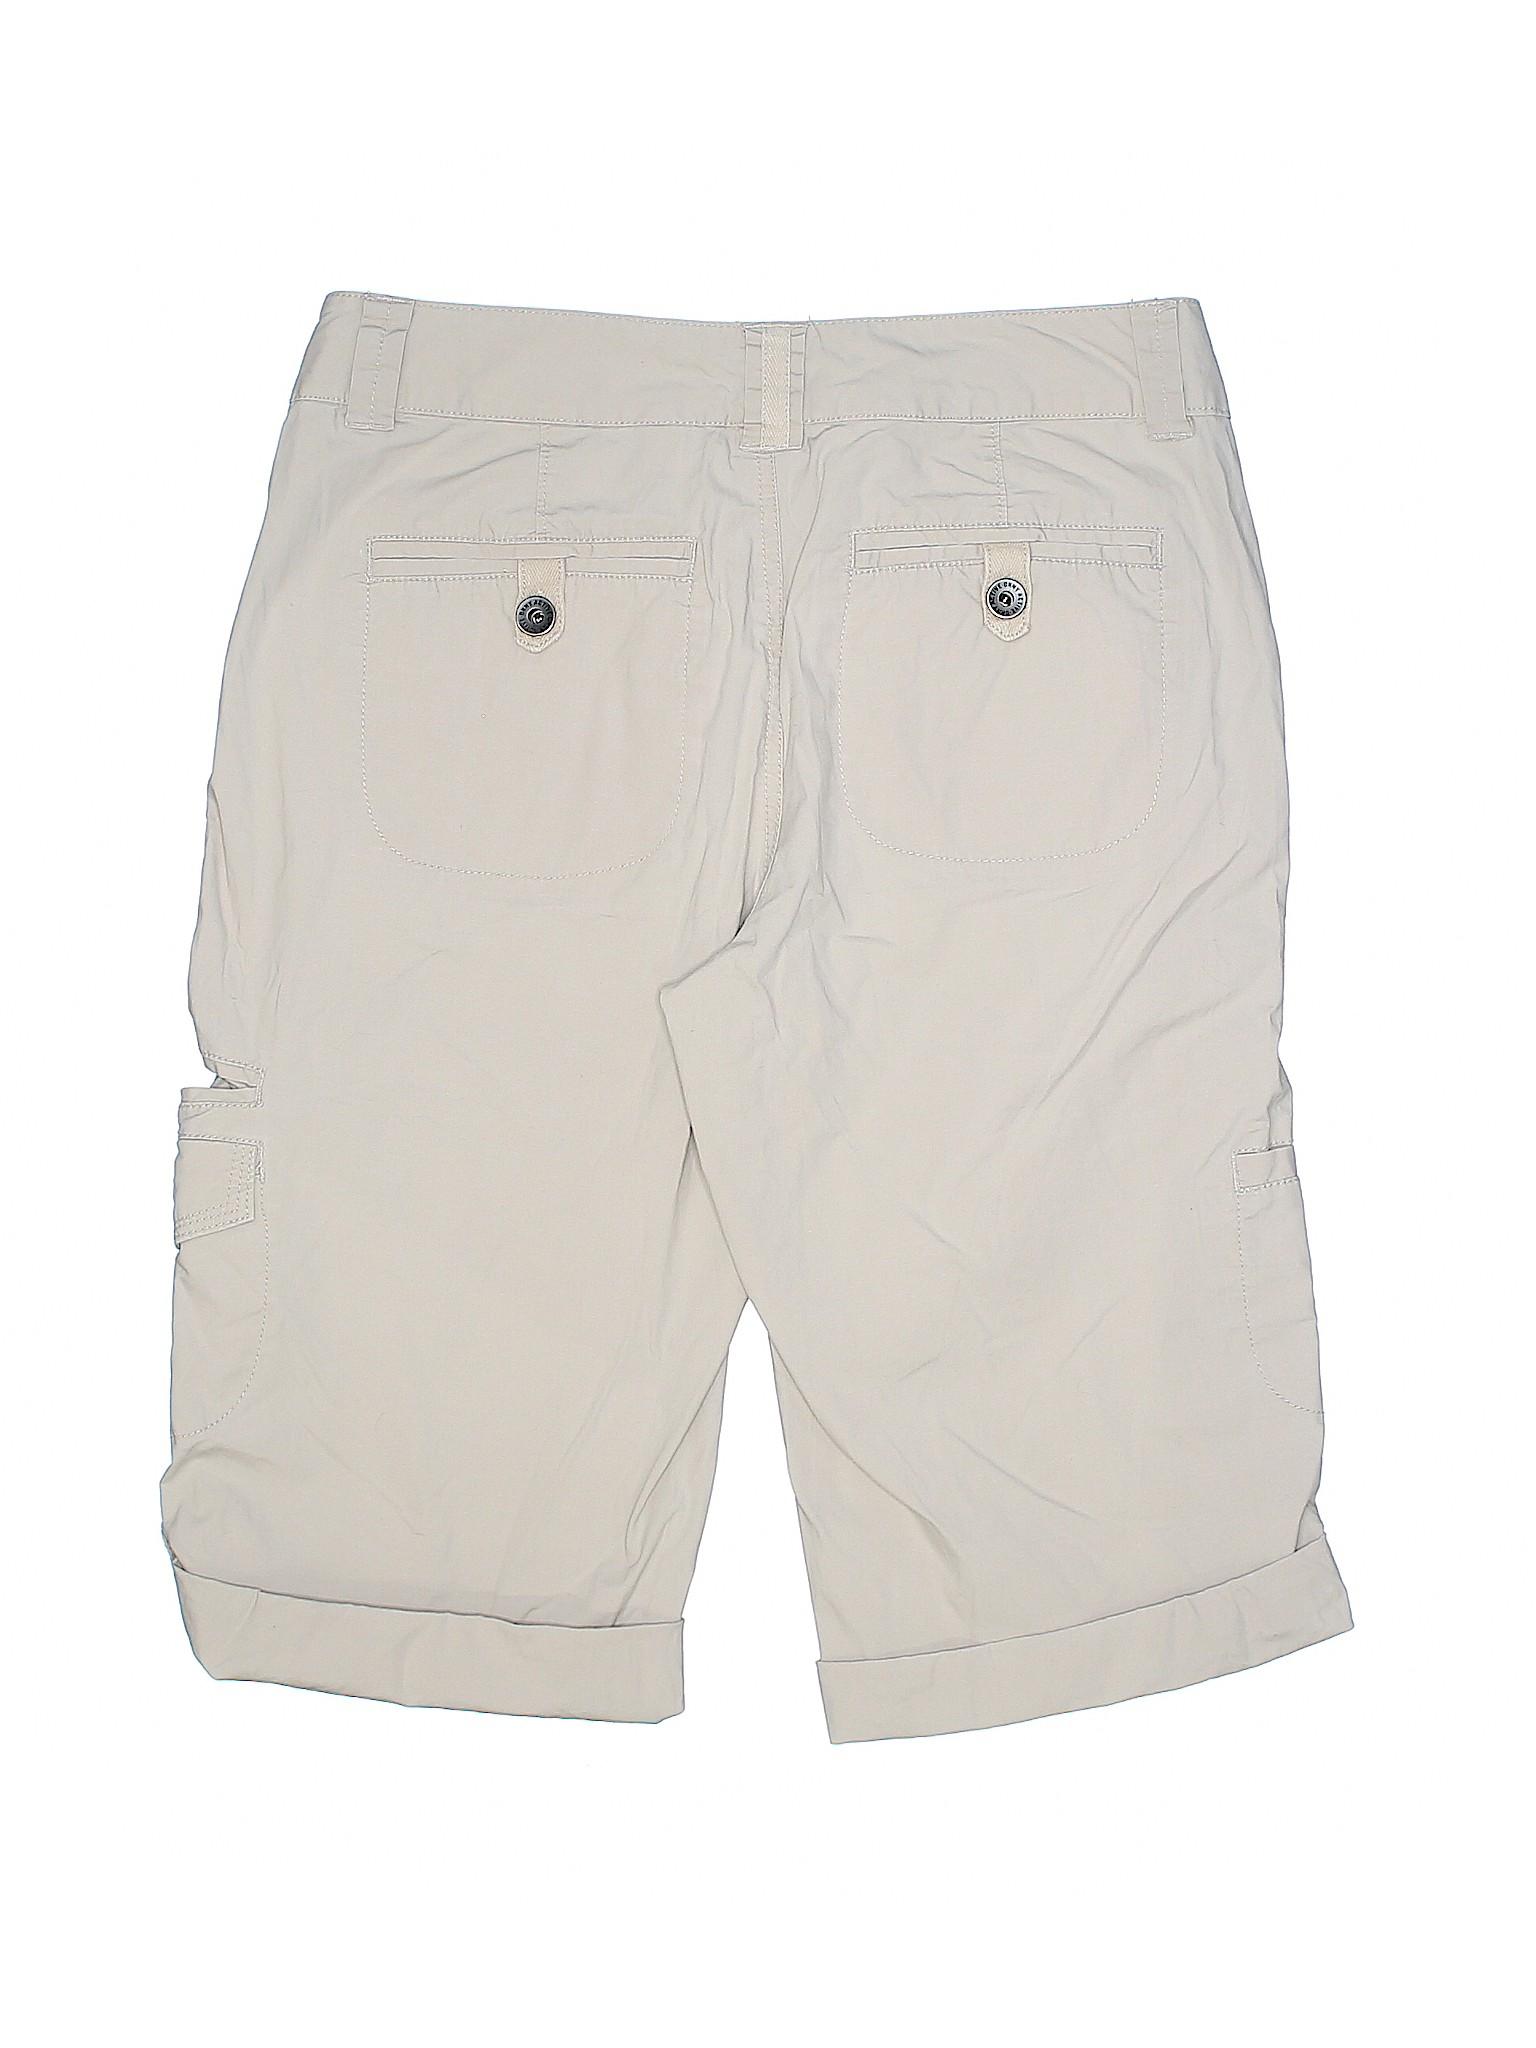 Dkny Shorts Cargo Cargo Dkny Boutique Shorts Boutique 4F8qP